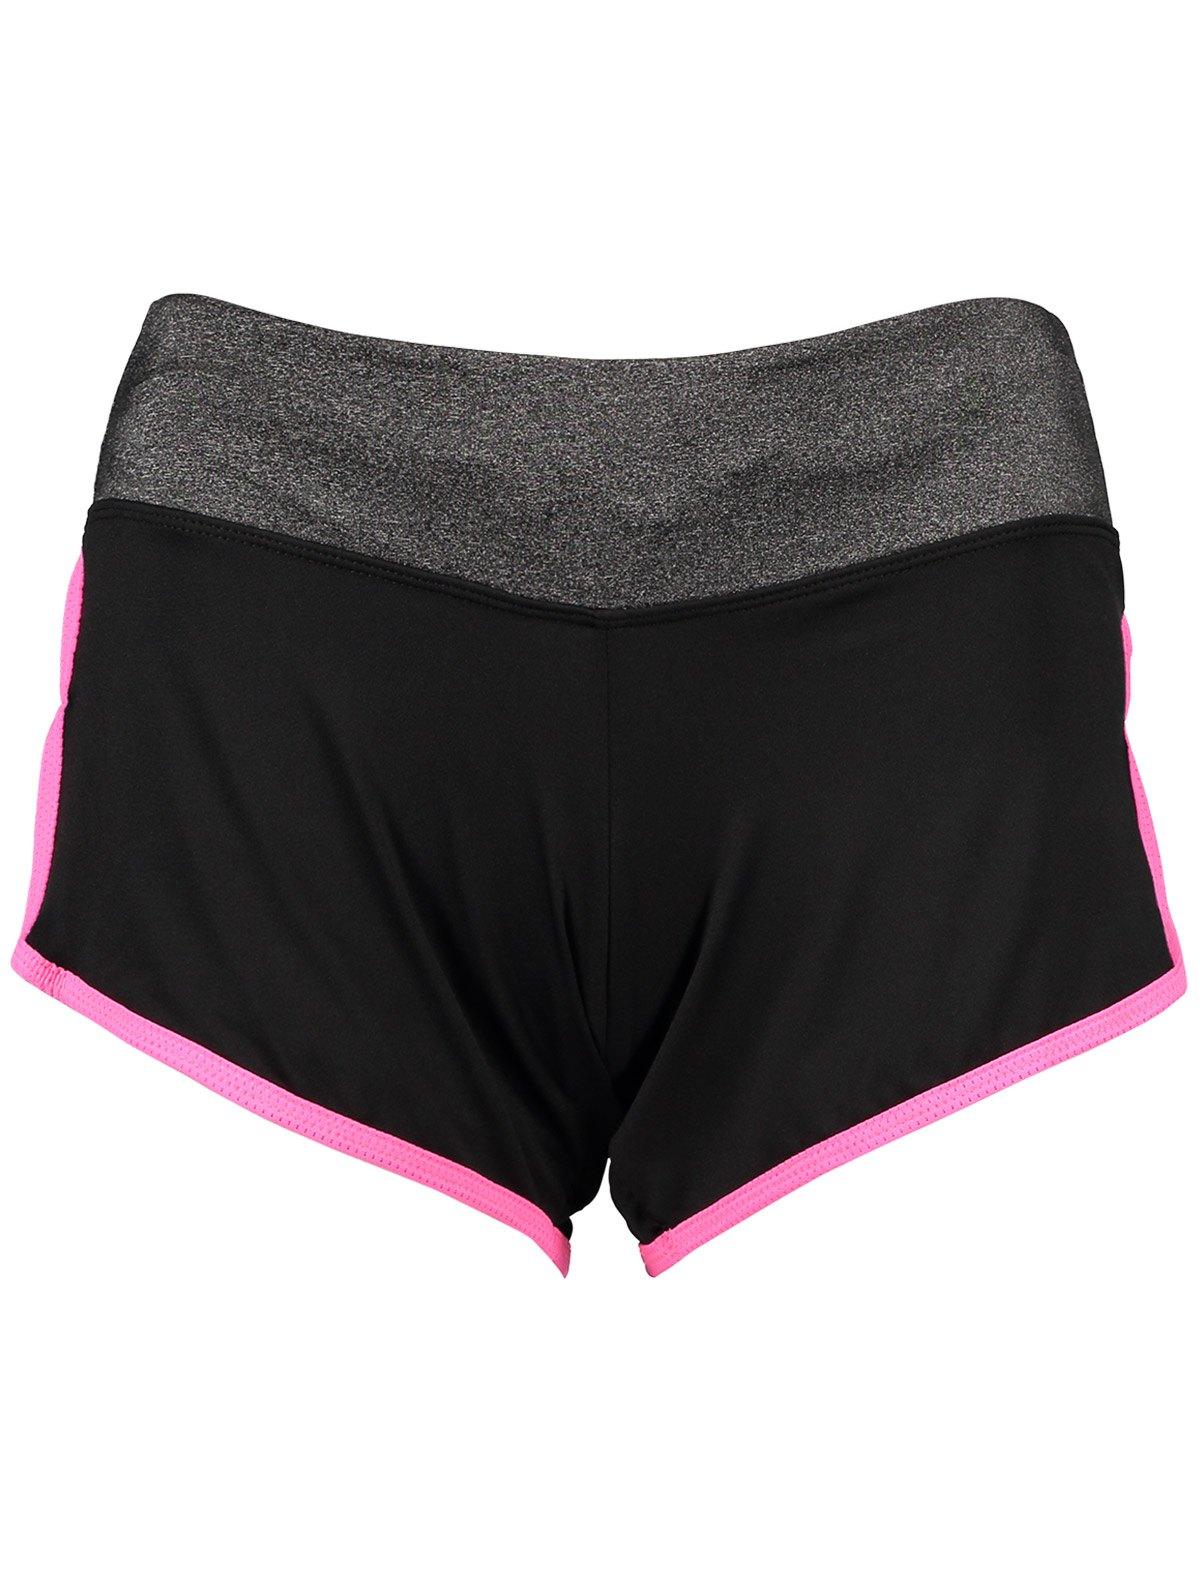 Piped Running Shorts